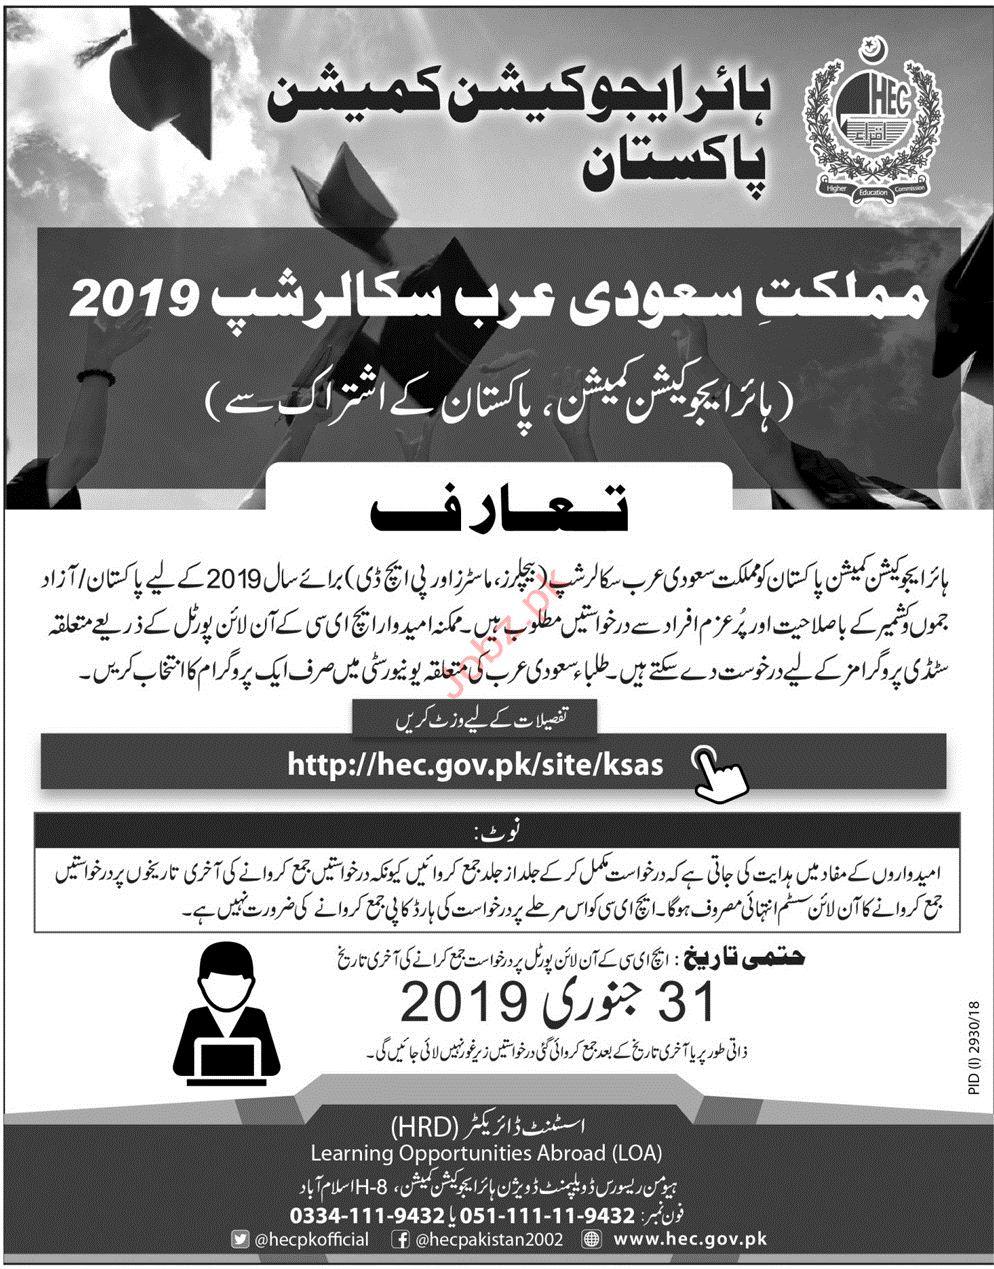 Higher Education commission Scholarship Program 2019